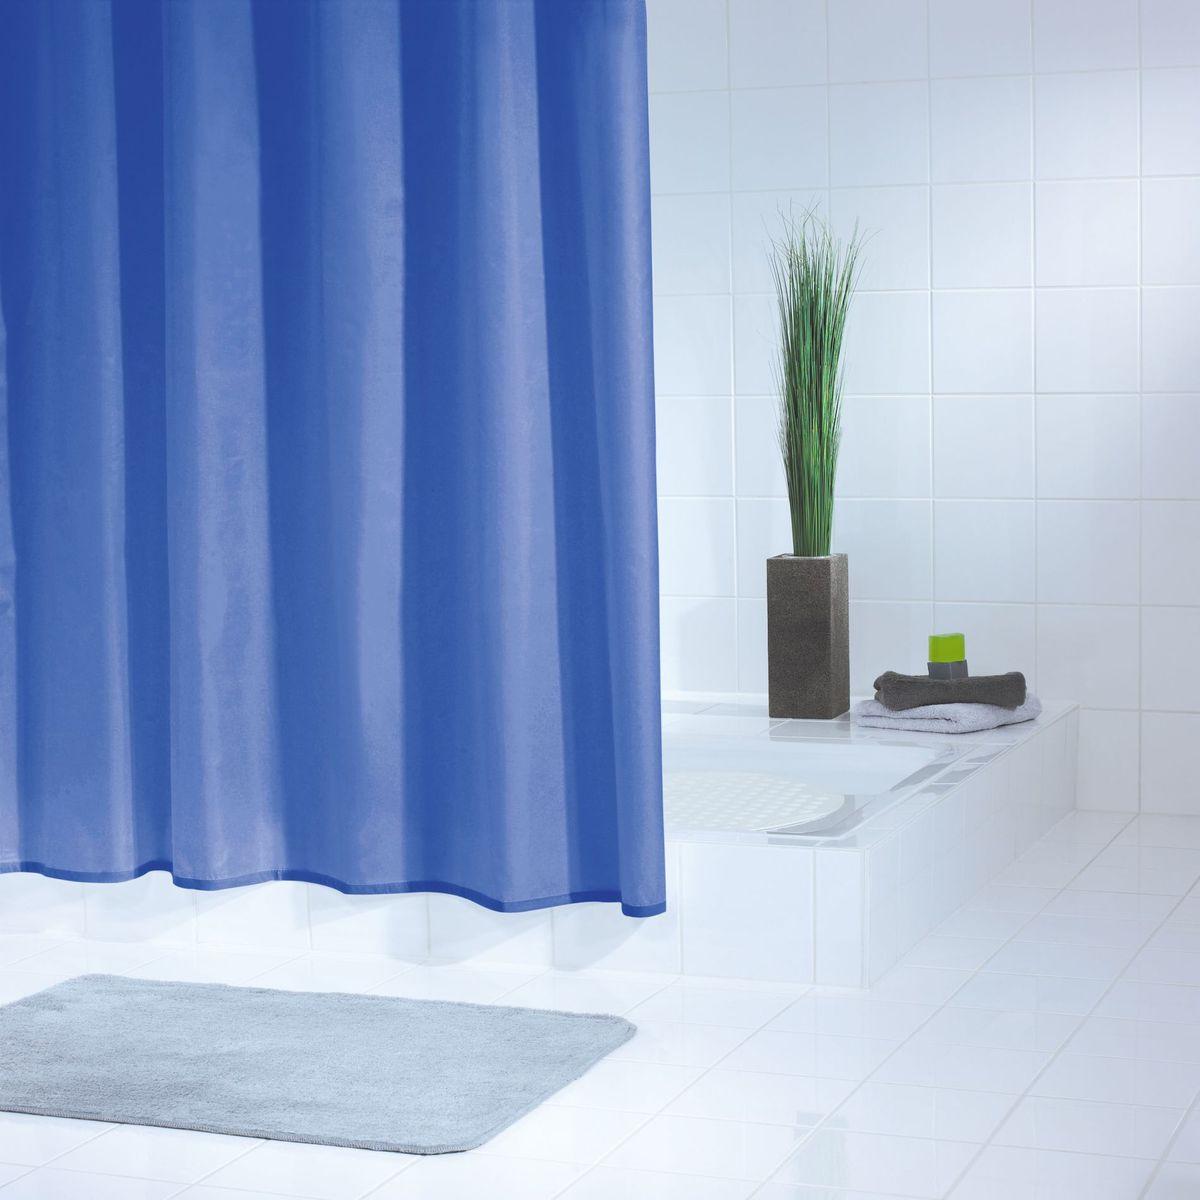 Штора для ванной комнаты Ridder Standard, цвет: синий, голубой, 180 х 200 см